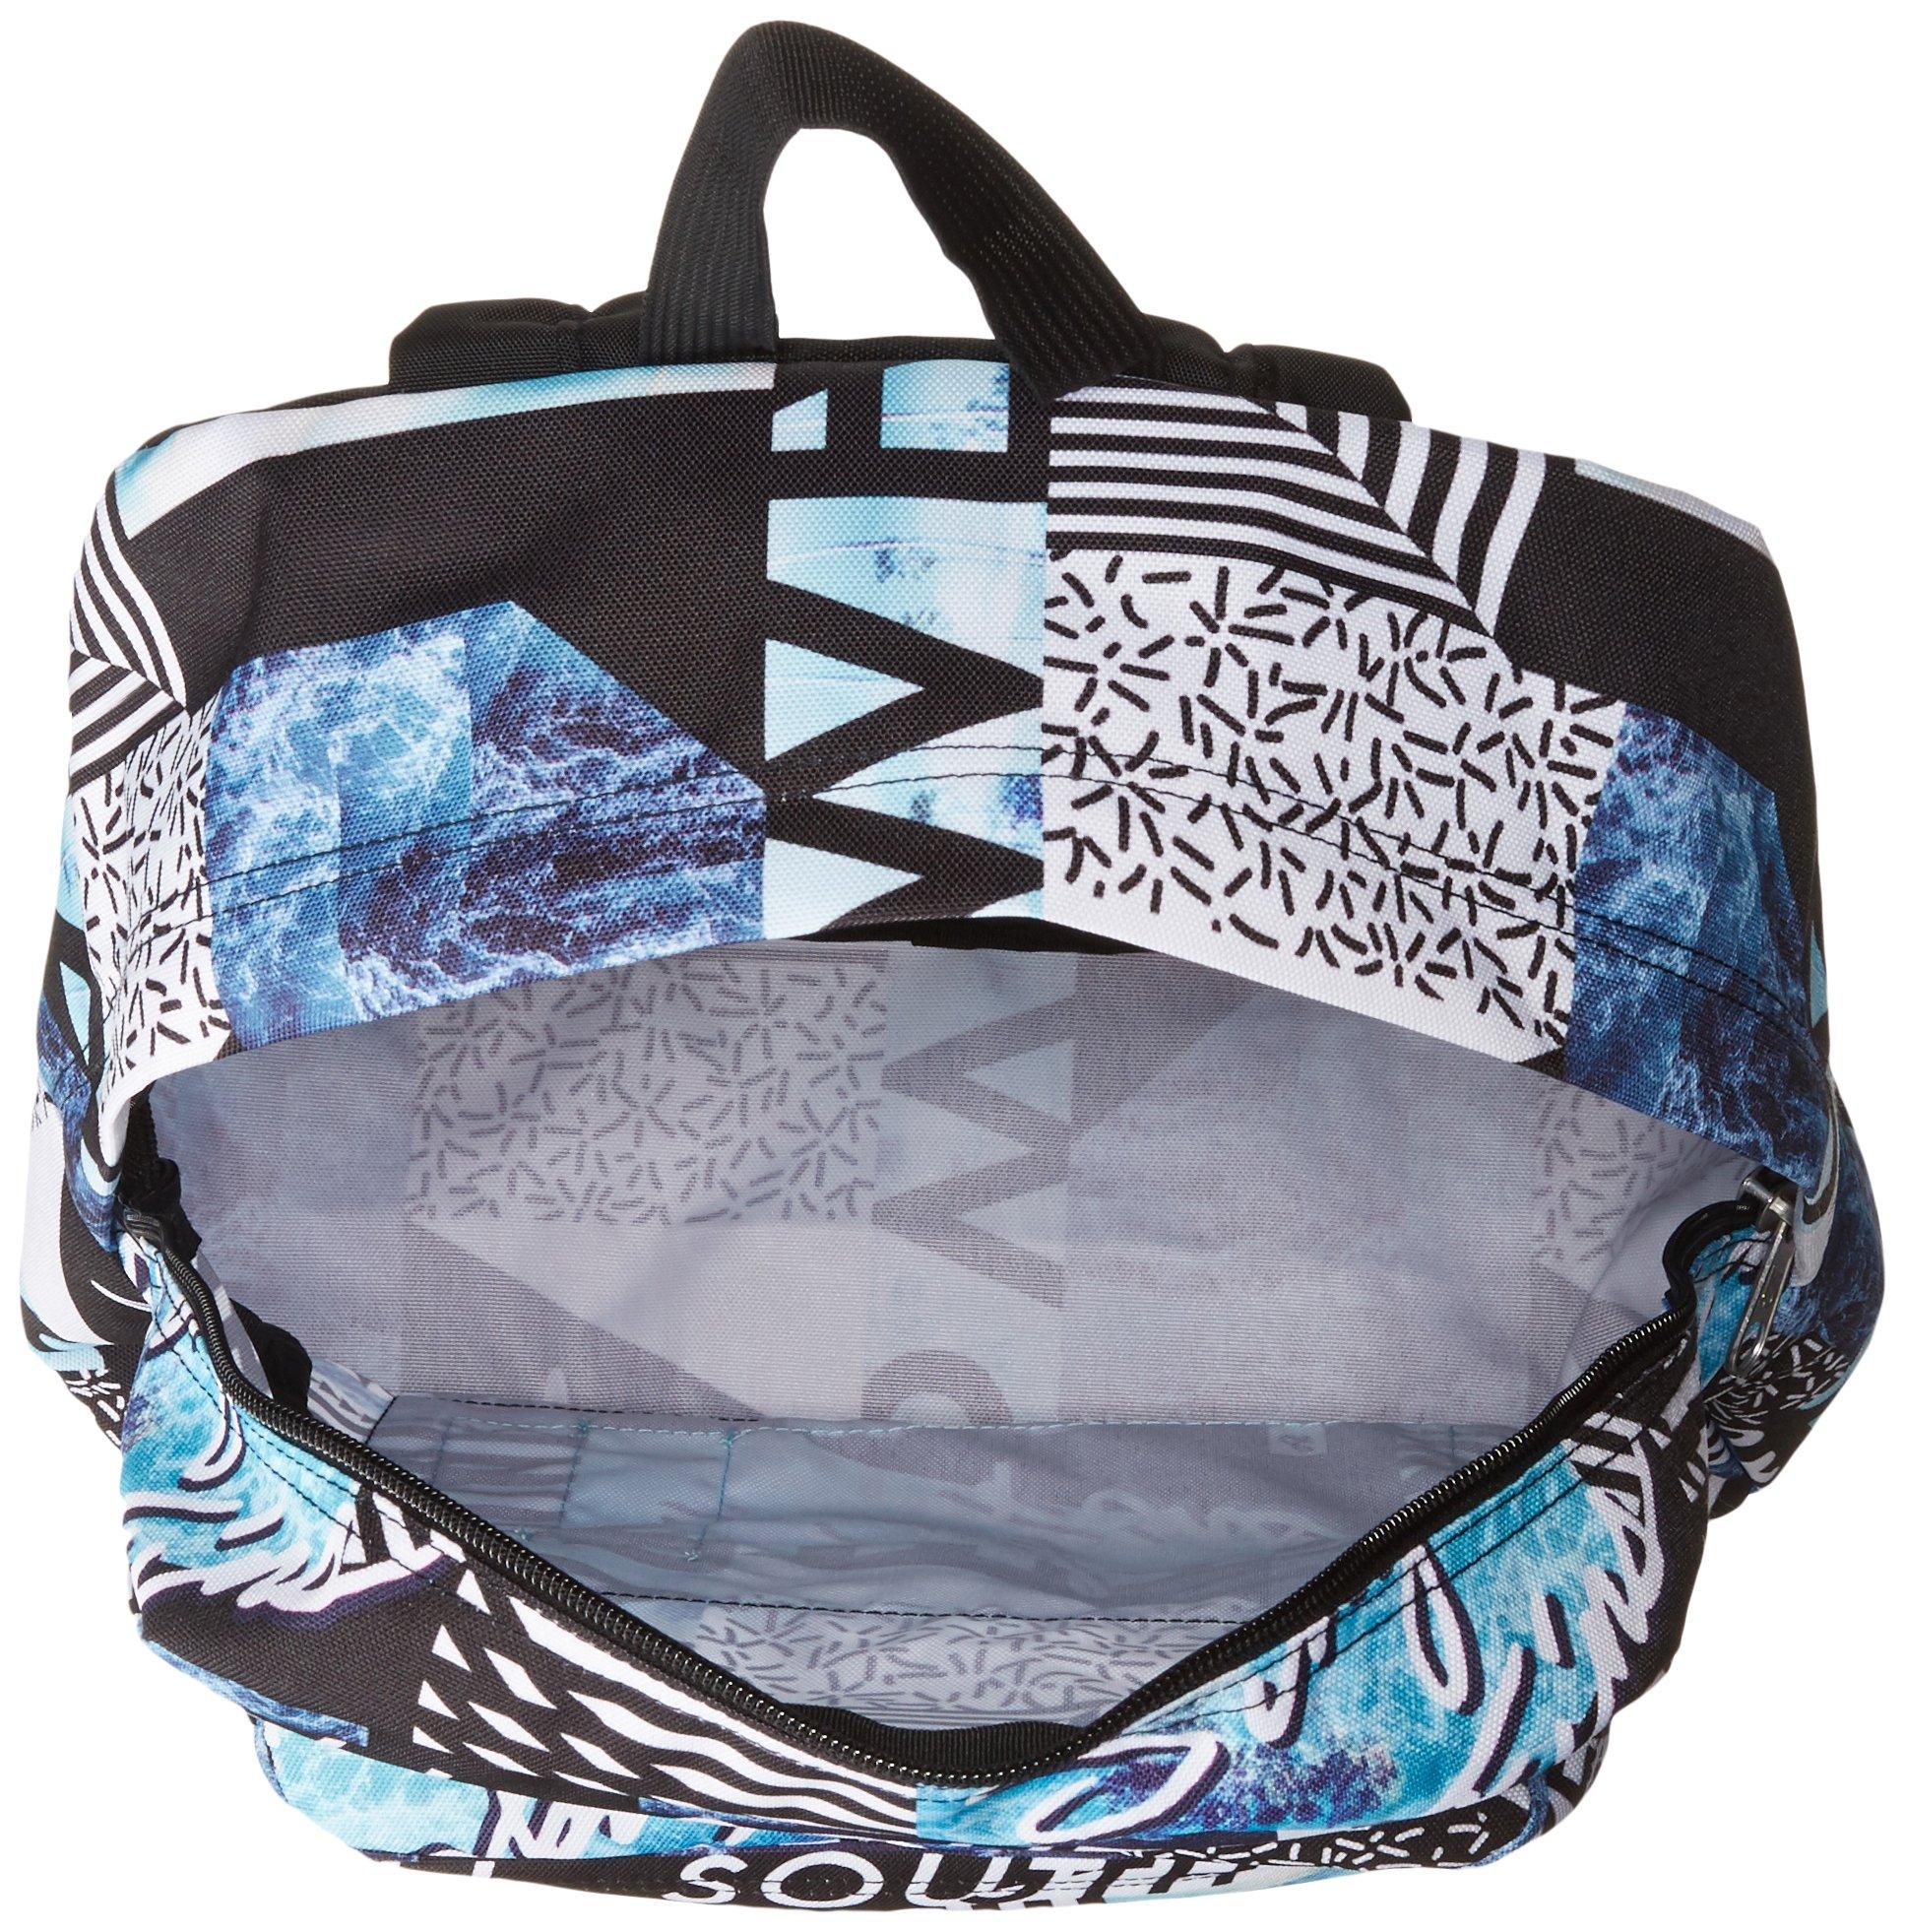 Jansport Superbreak Multi South Swell Daftar Harga Terkini Tas Black Label Fishing Lures New Backpack Sw T5010wz Casual Daypacks Clothing Shoes